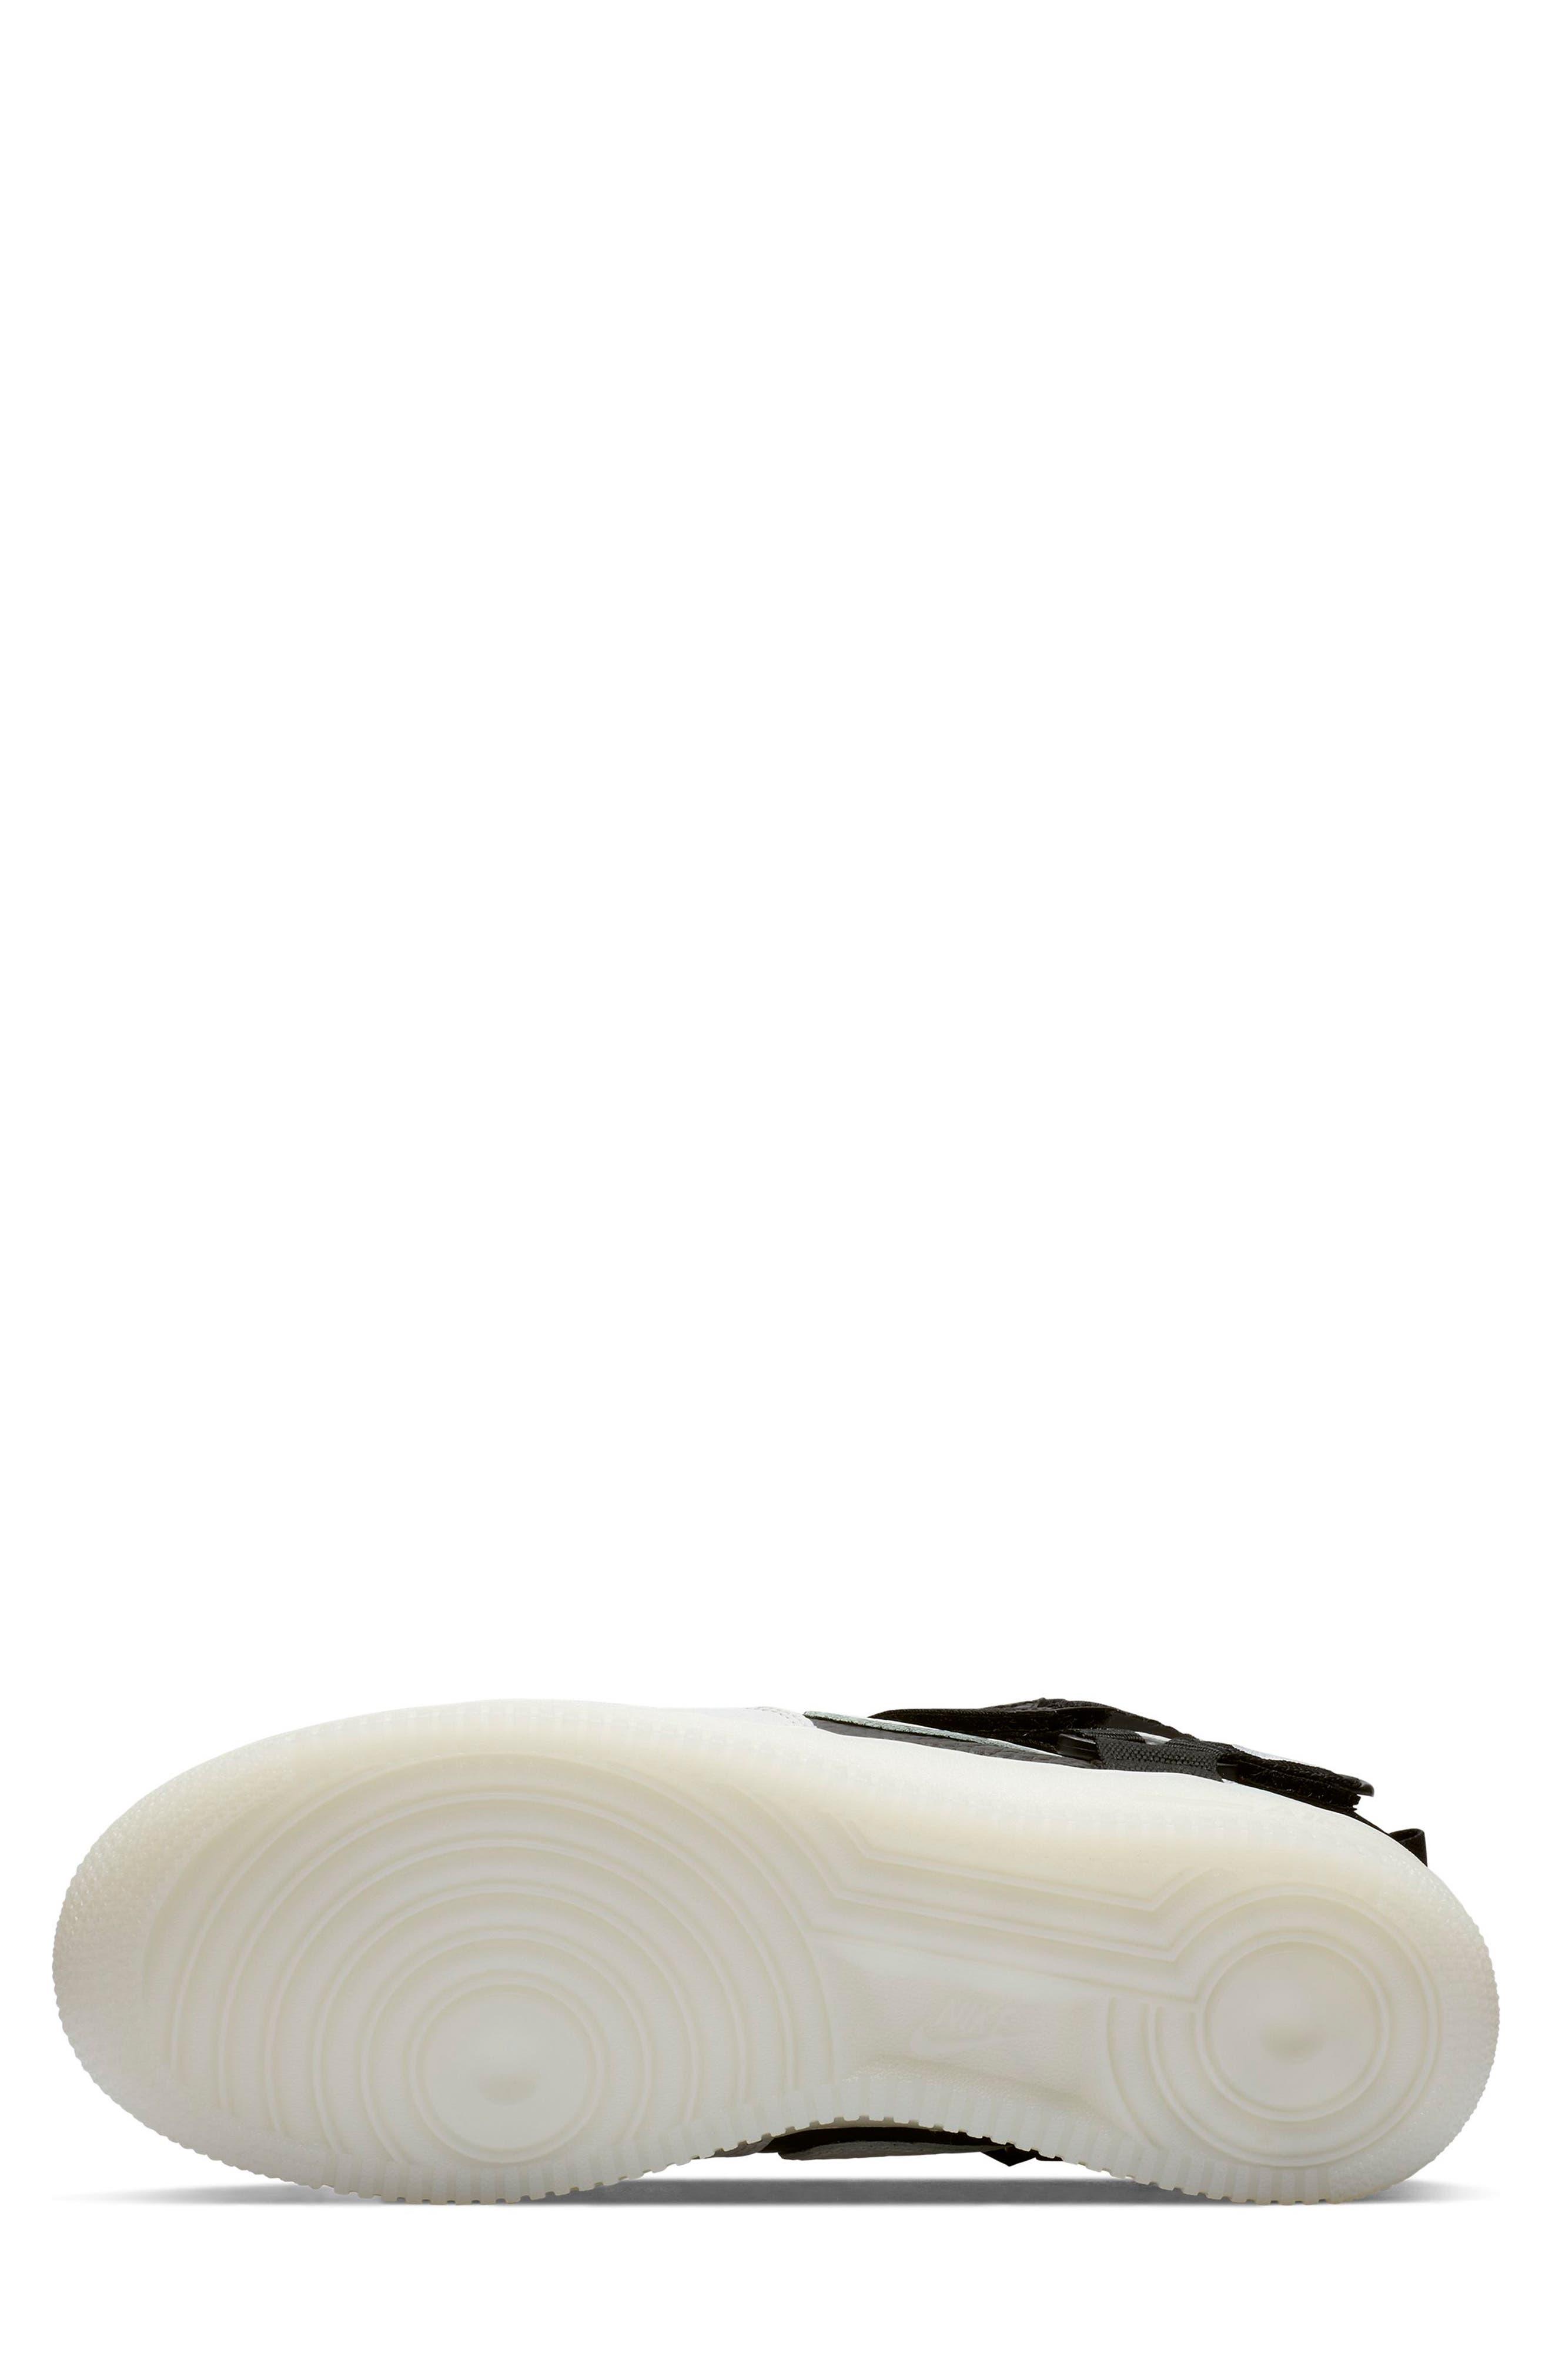 NIKE, Air Force 1 Utility Mid Sneaker, Alternate thumbnail 5, color, OFF WHITE/ BLACK/ WHITE